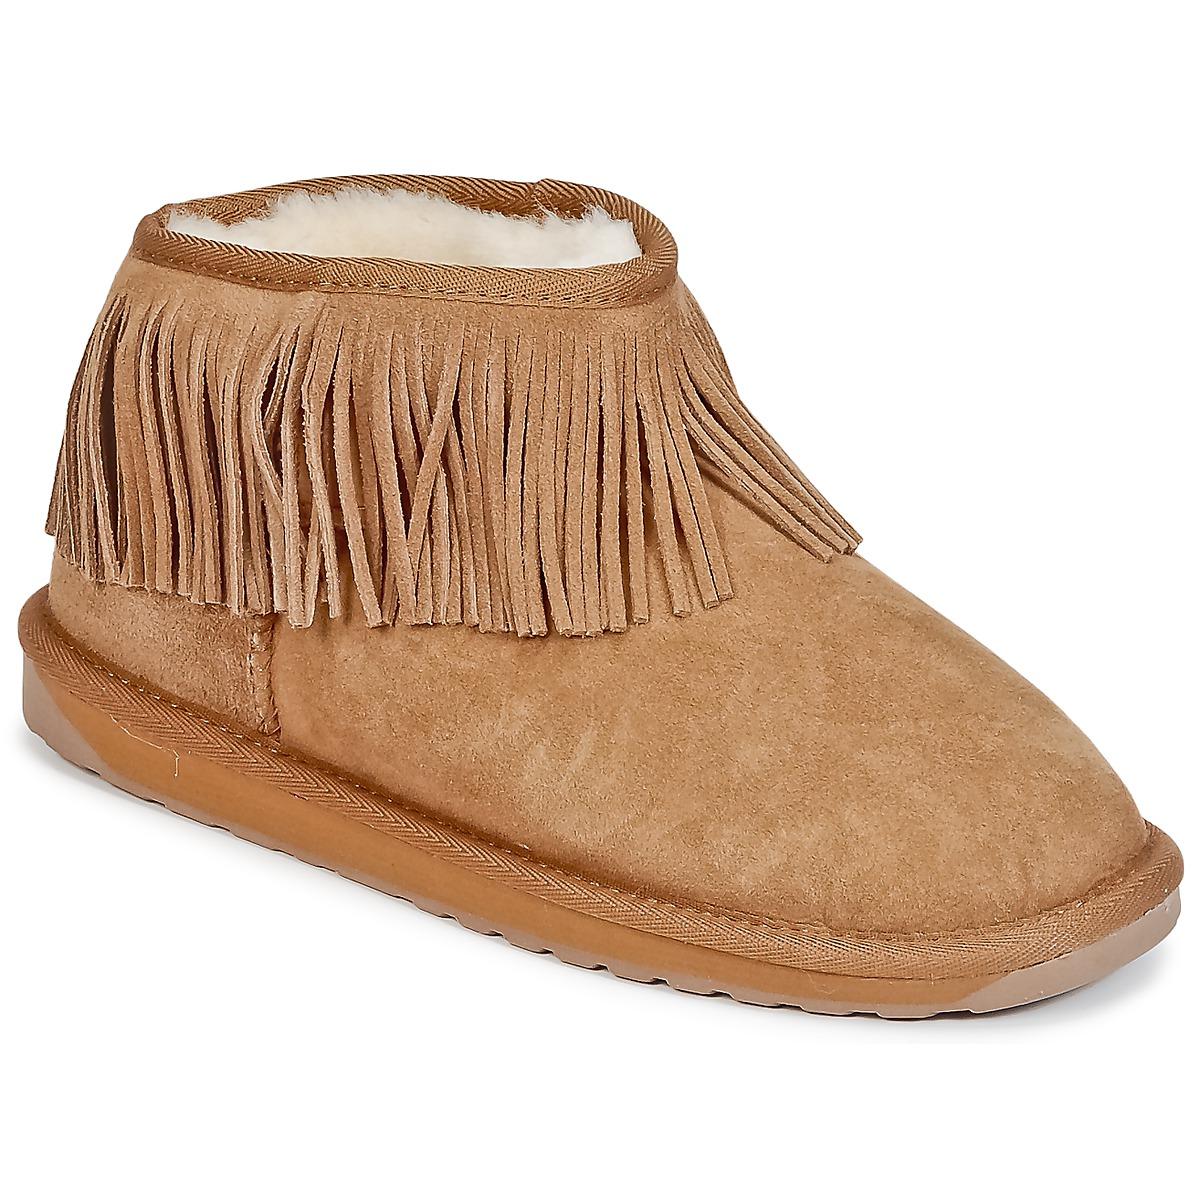 EMU WATERFALL Chatain - Livraison Gratuite avec  - Chaussures Boot Femme